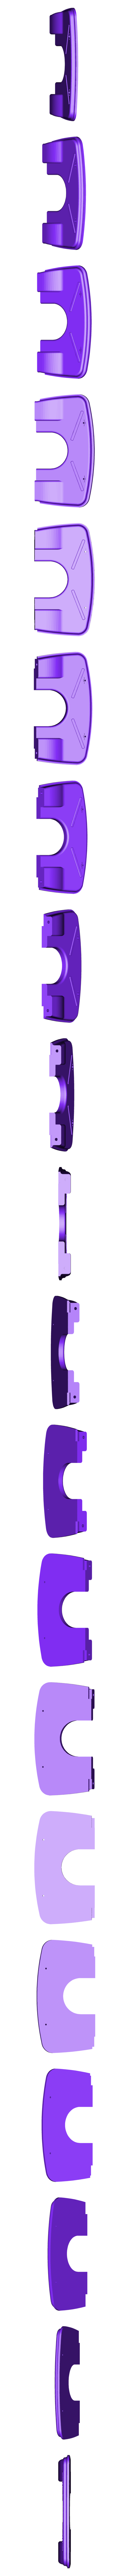 spu34firewall.stl Download STL file 34' Ford Pickup Hot Rod • 3D printing object, macone1